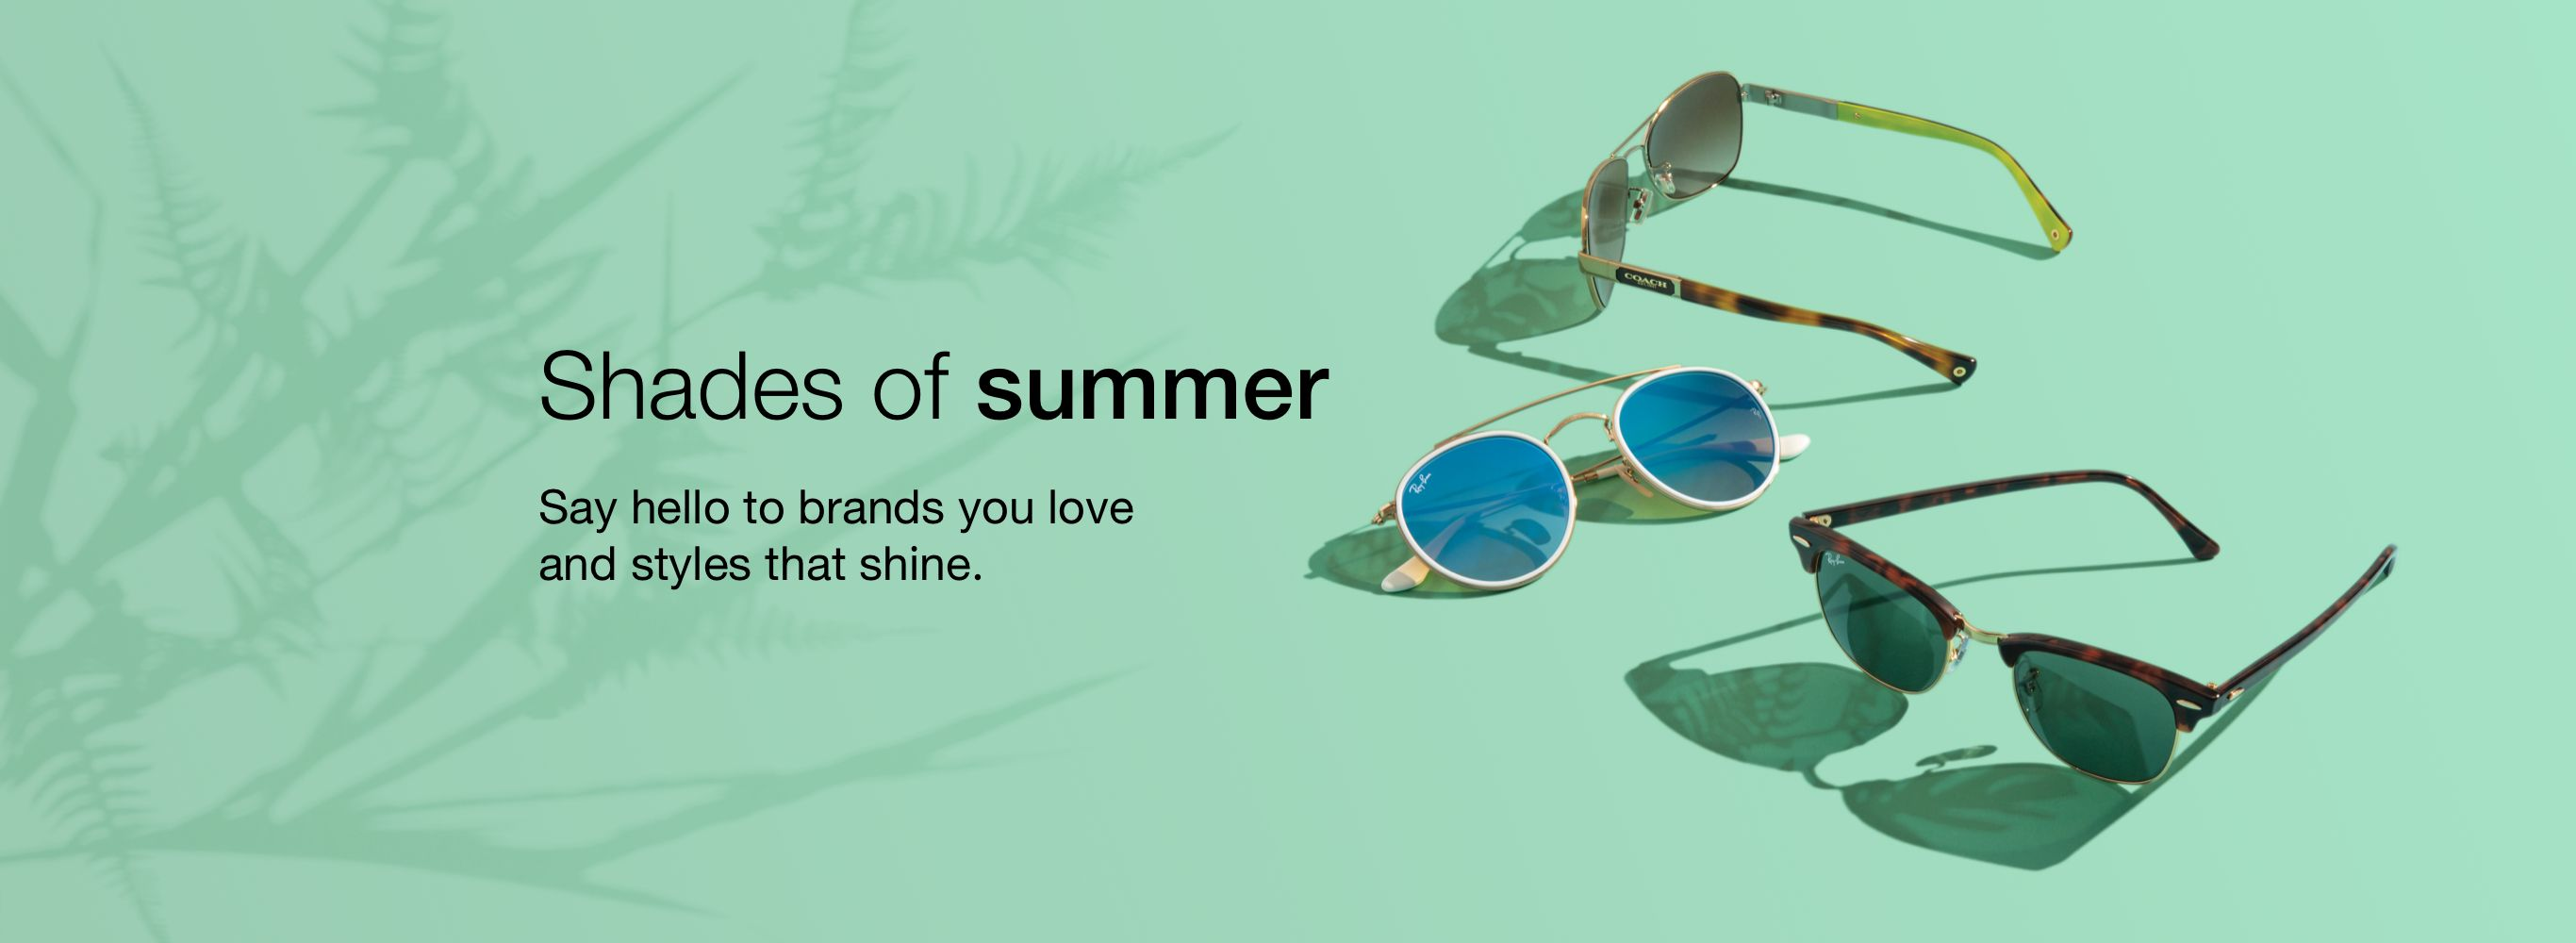 summer shades banner